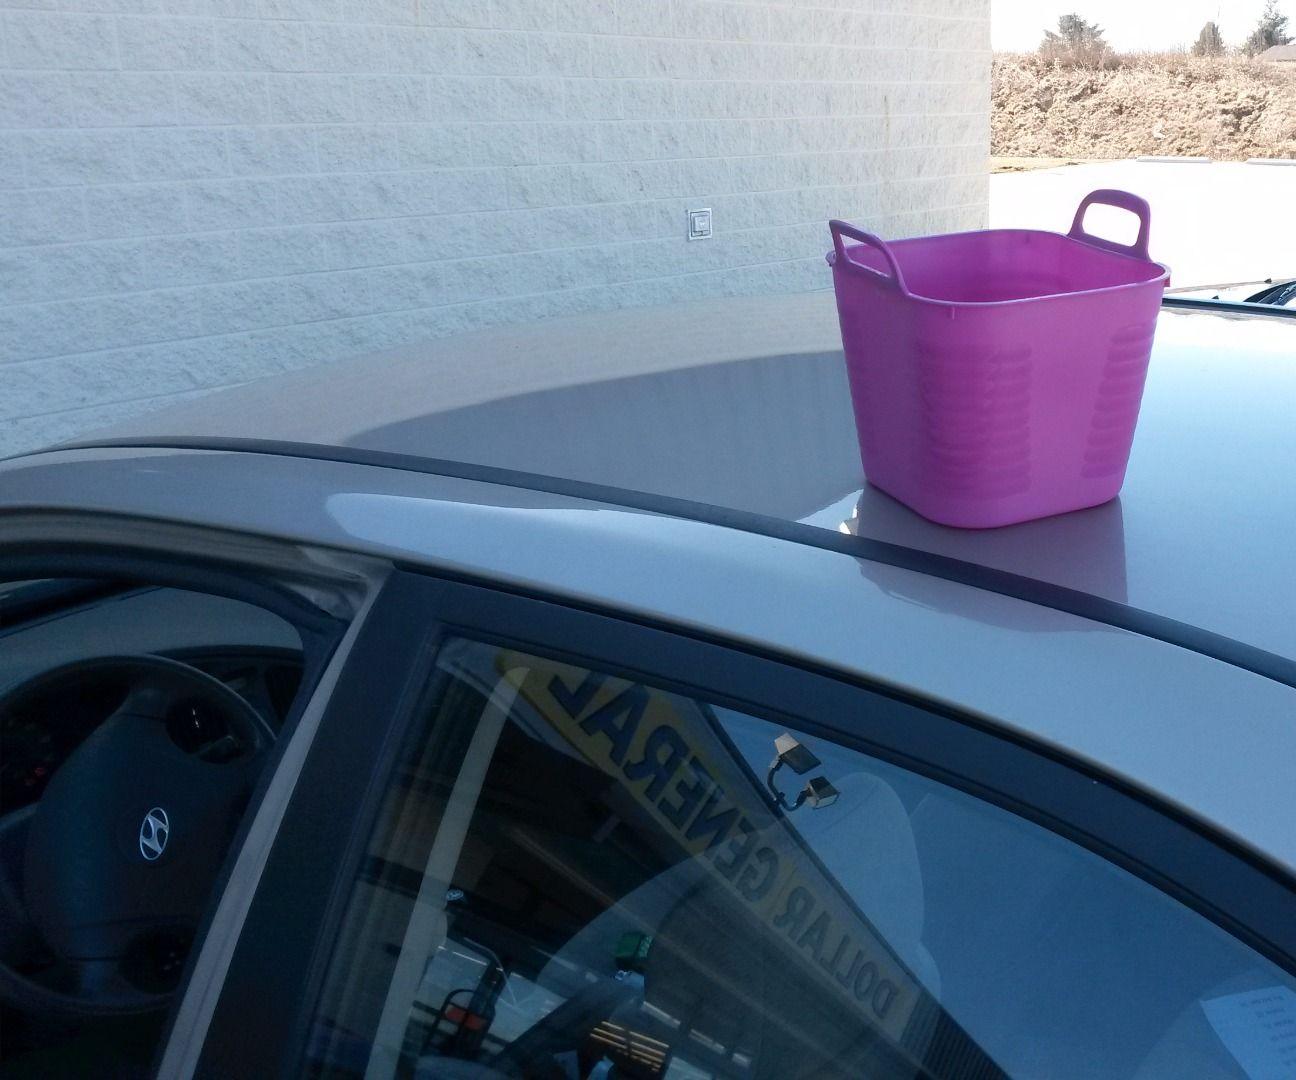 April Fool's Joke - Cup on Car